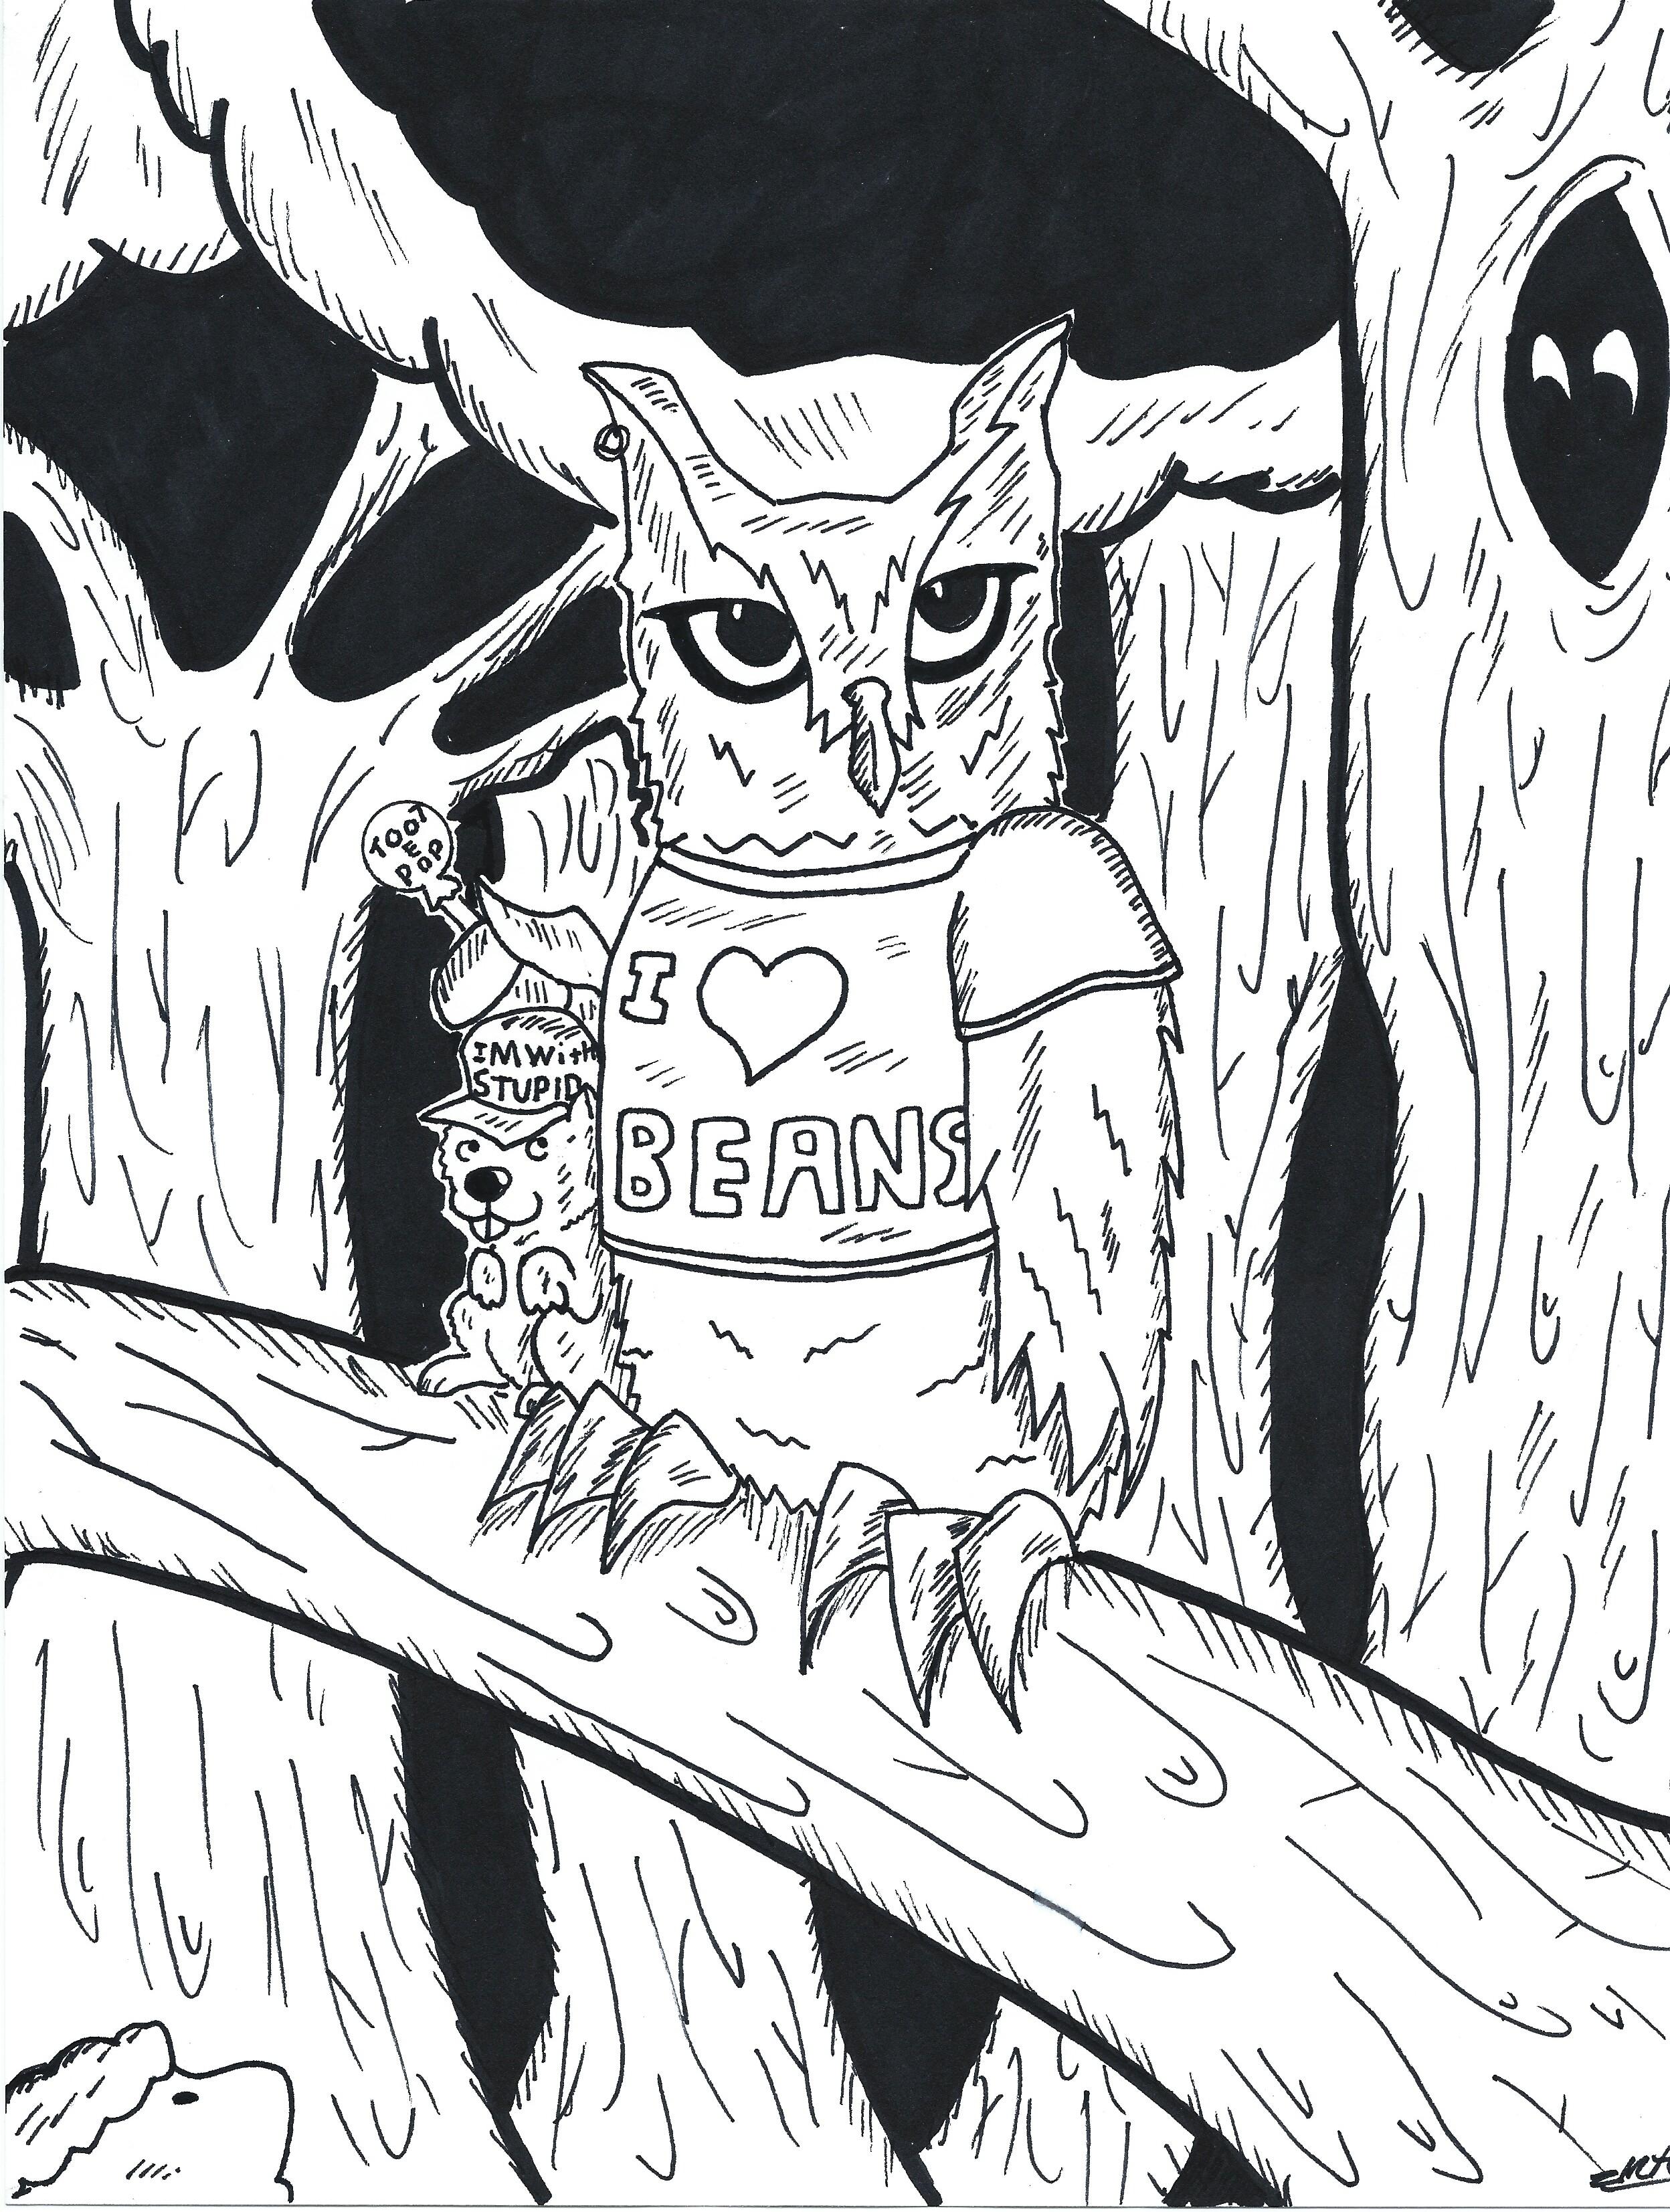 Screech owl (Inktober 2017 #9)